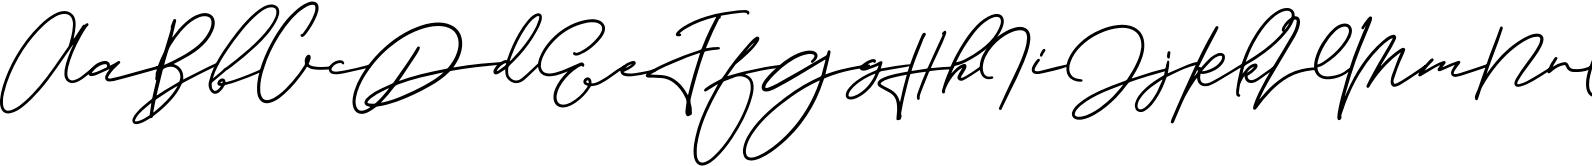 Jamsuit Duo Font